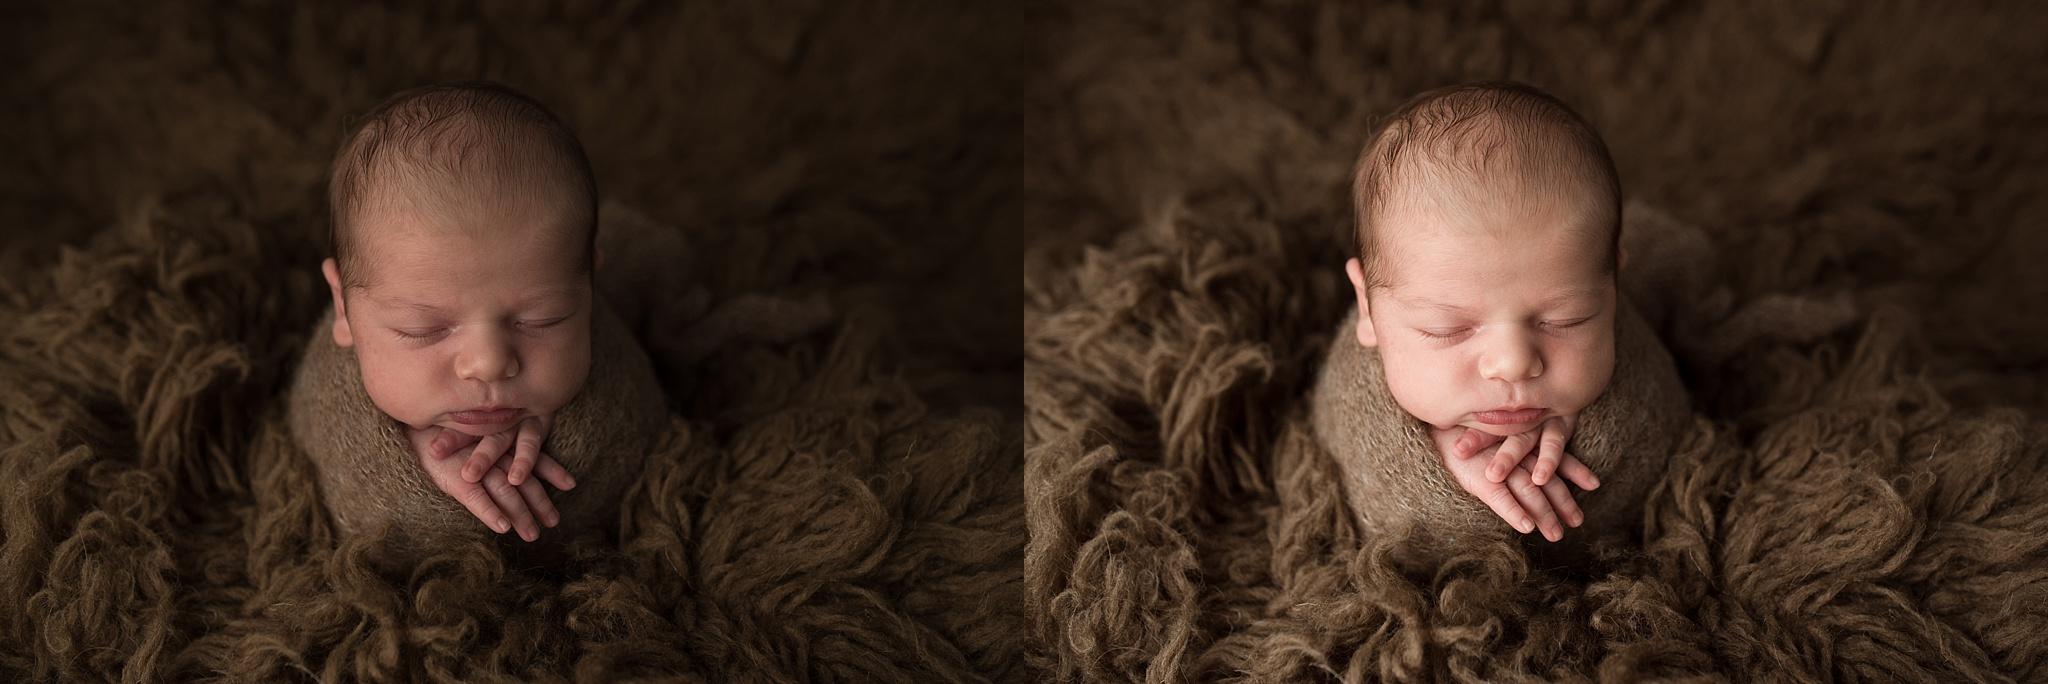 Jessica Fenfert Photography - Sandstone Collection